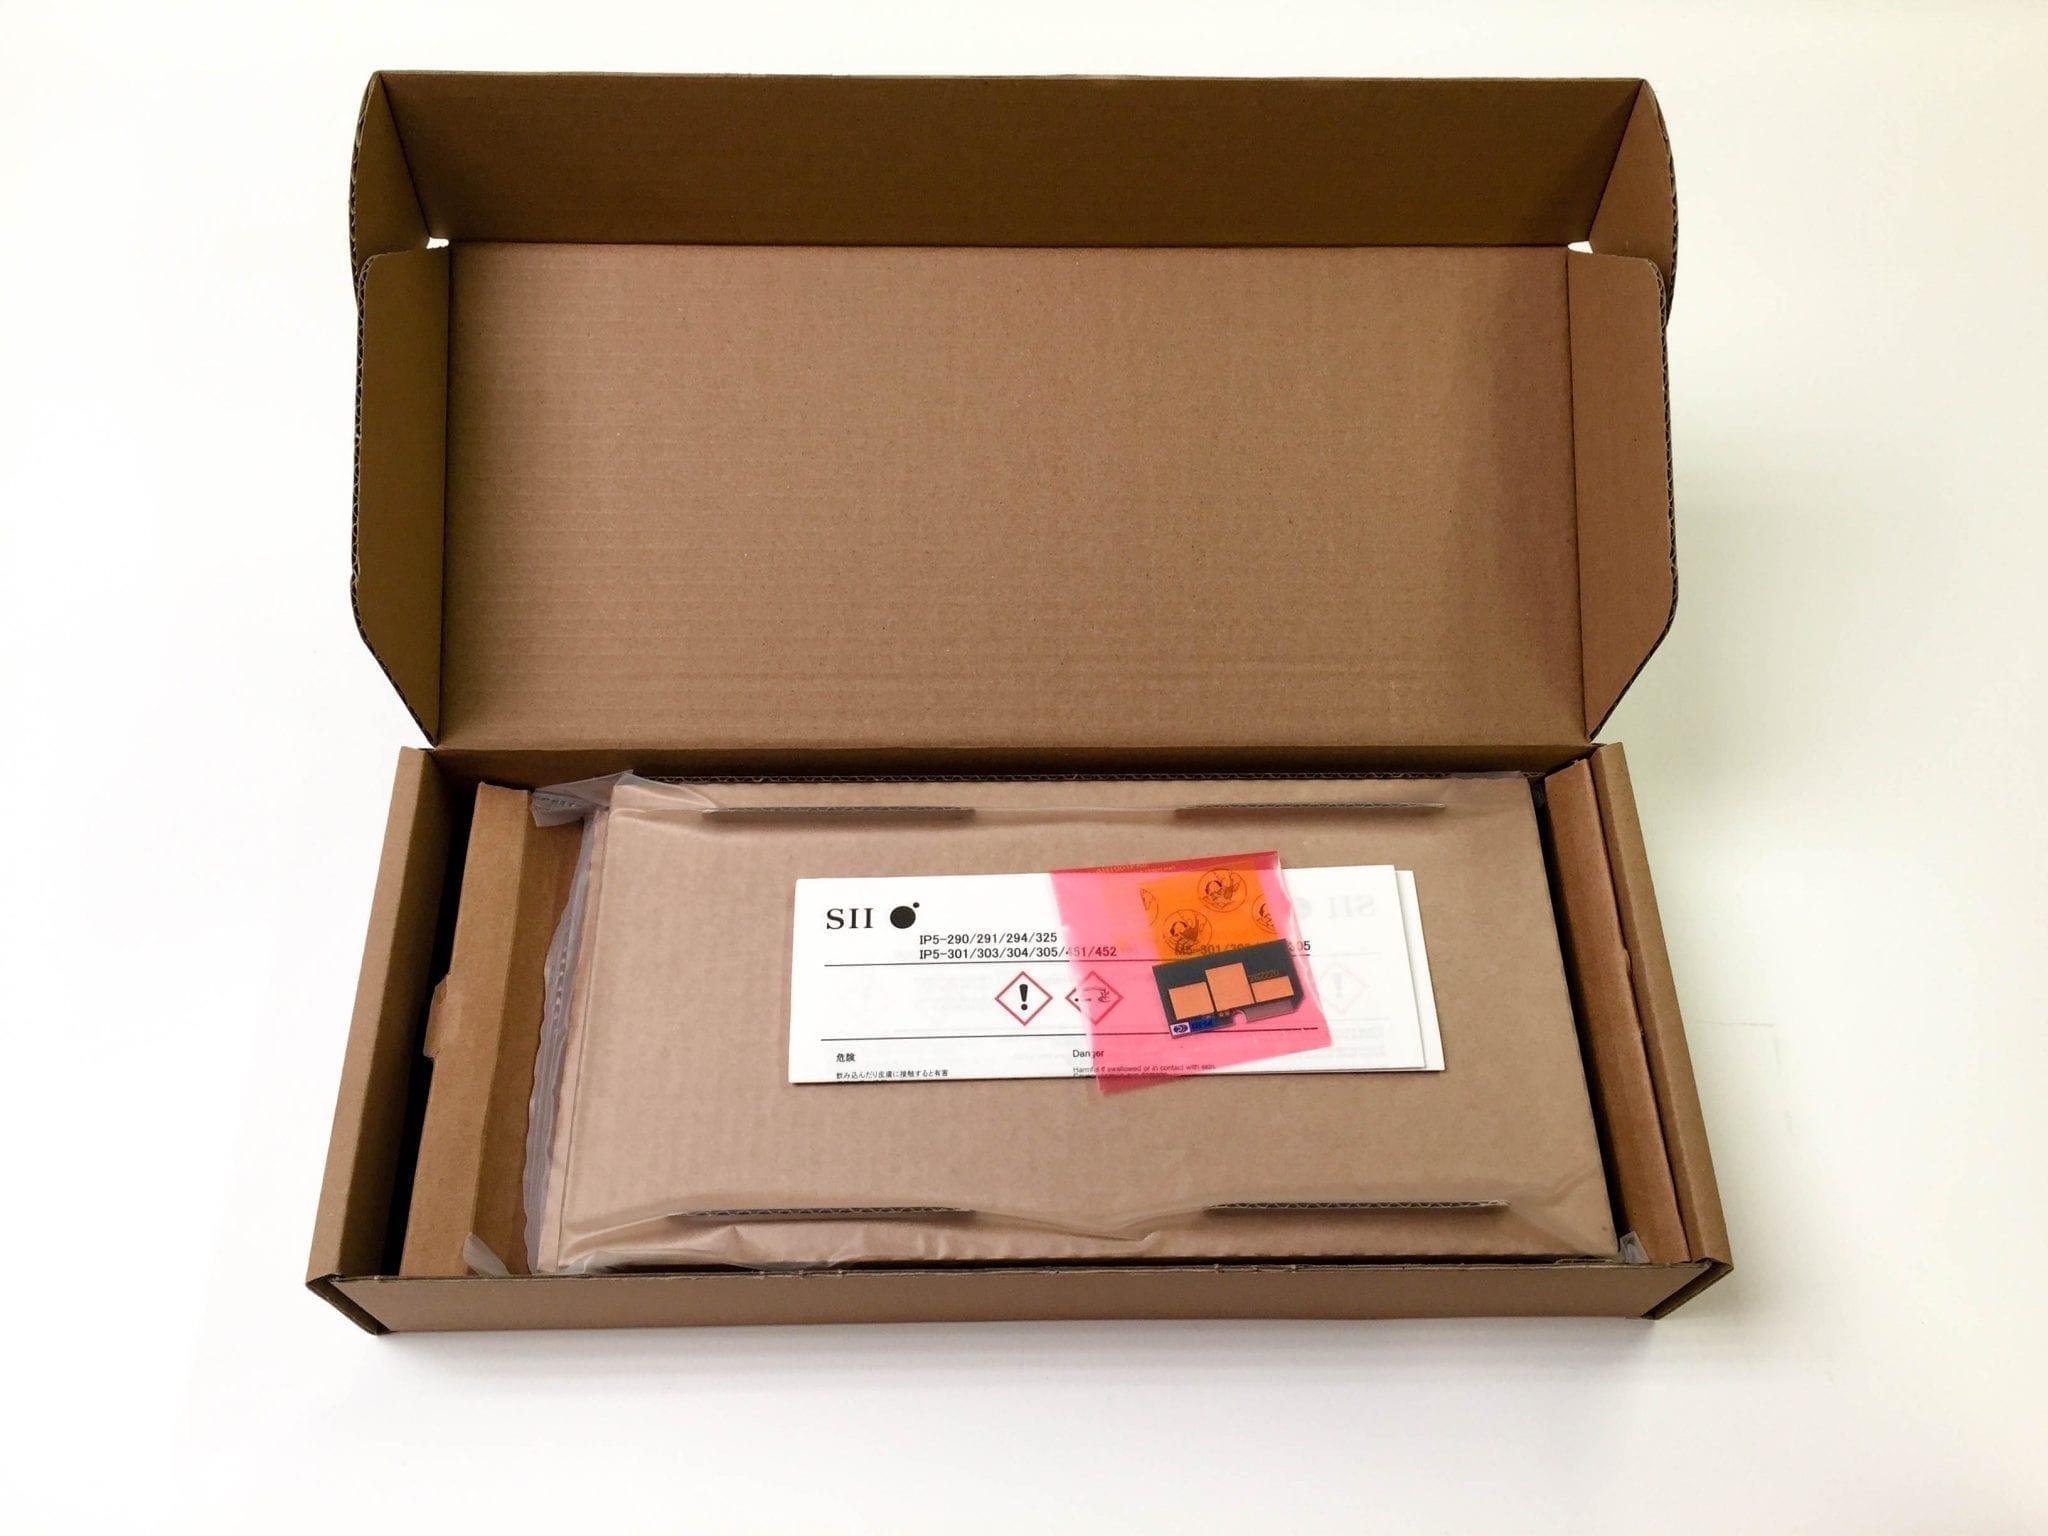 Canon Oki Colorpainter H3 Series Driver Download Compatibility